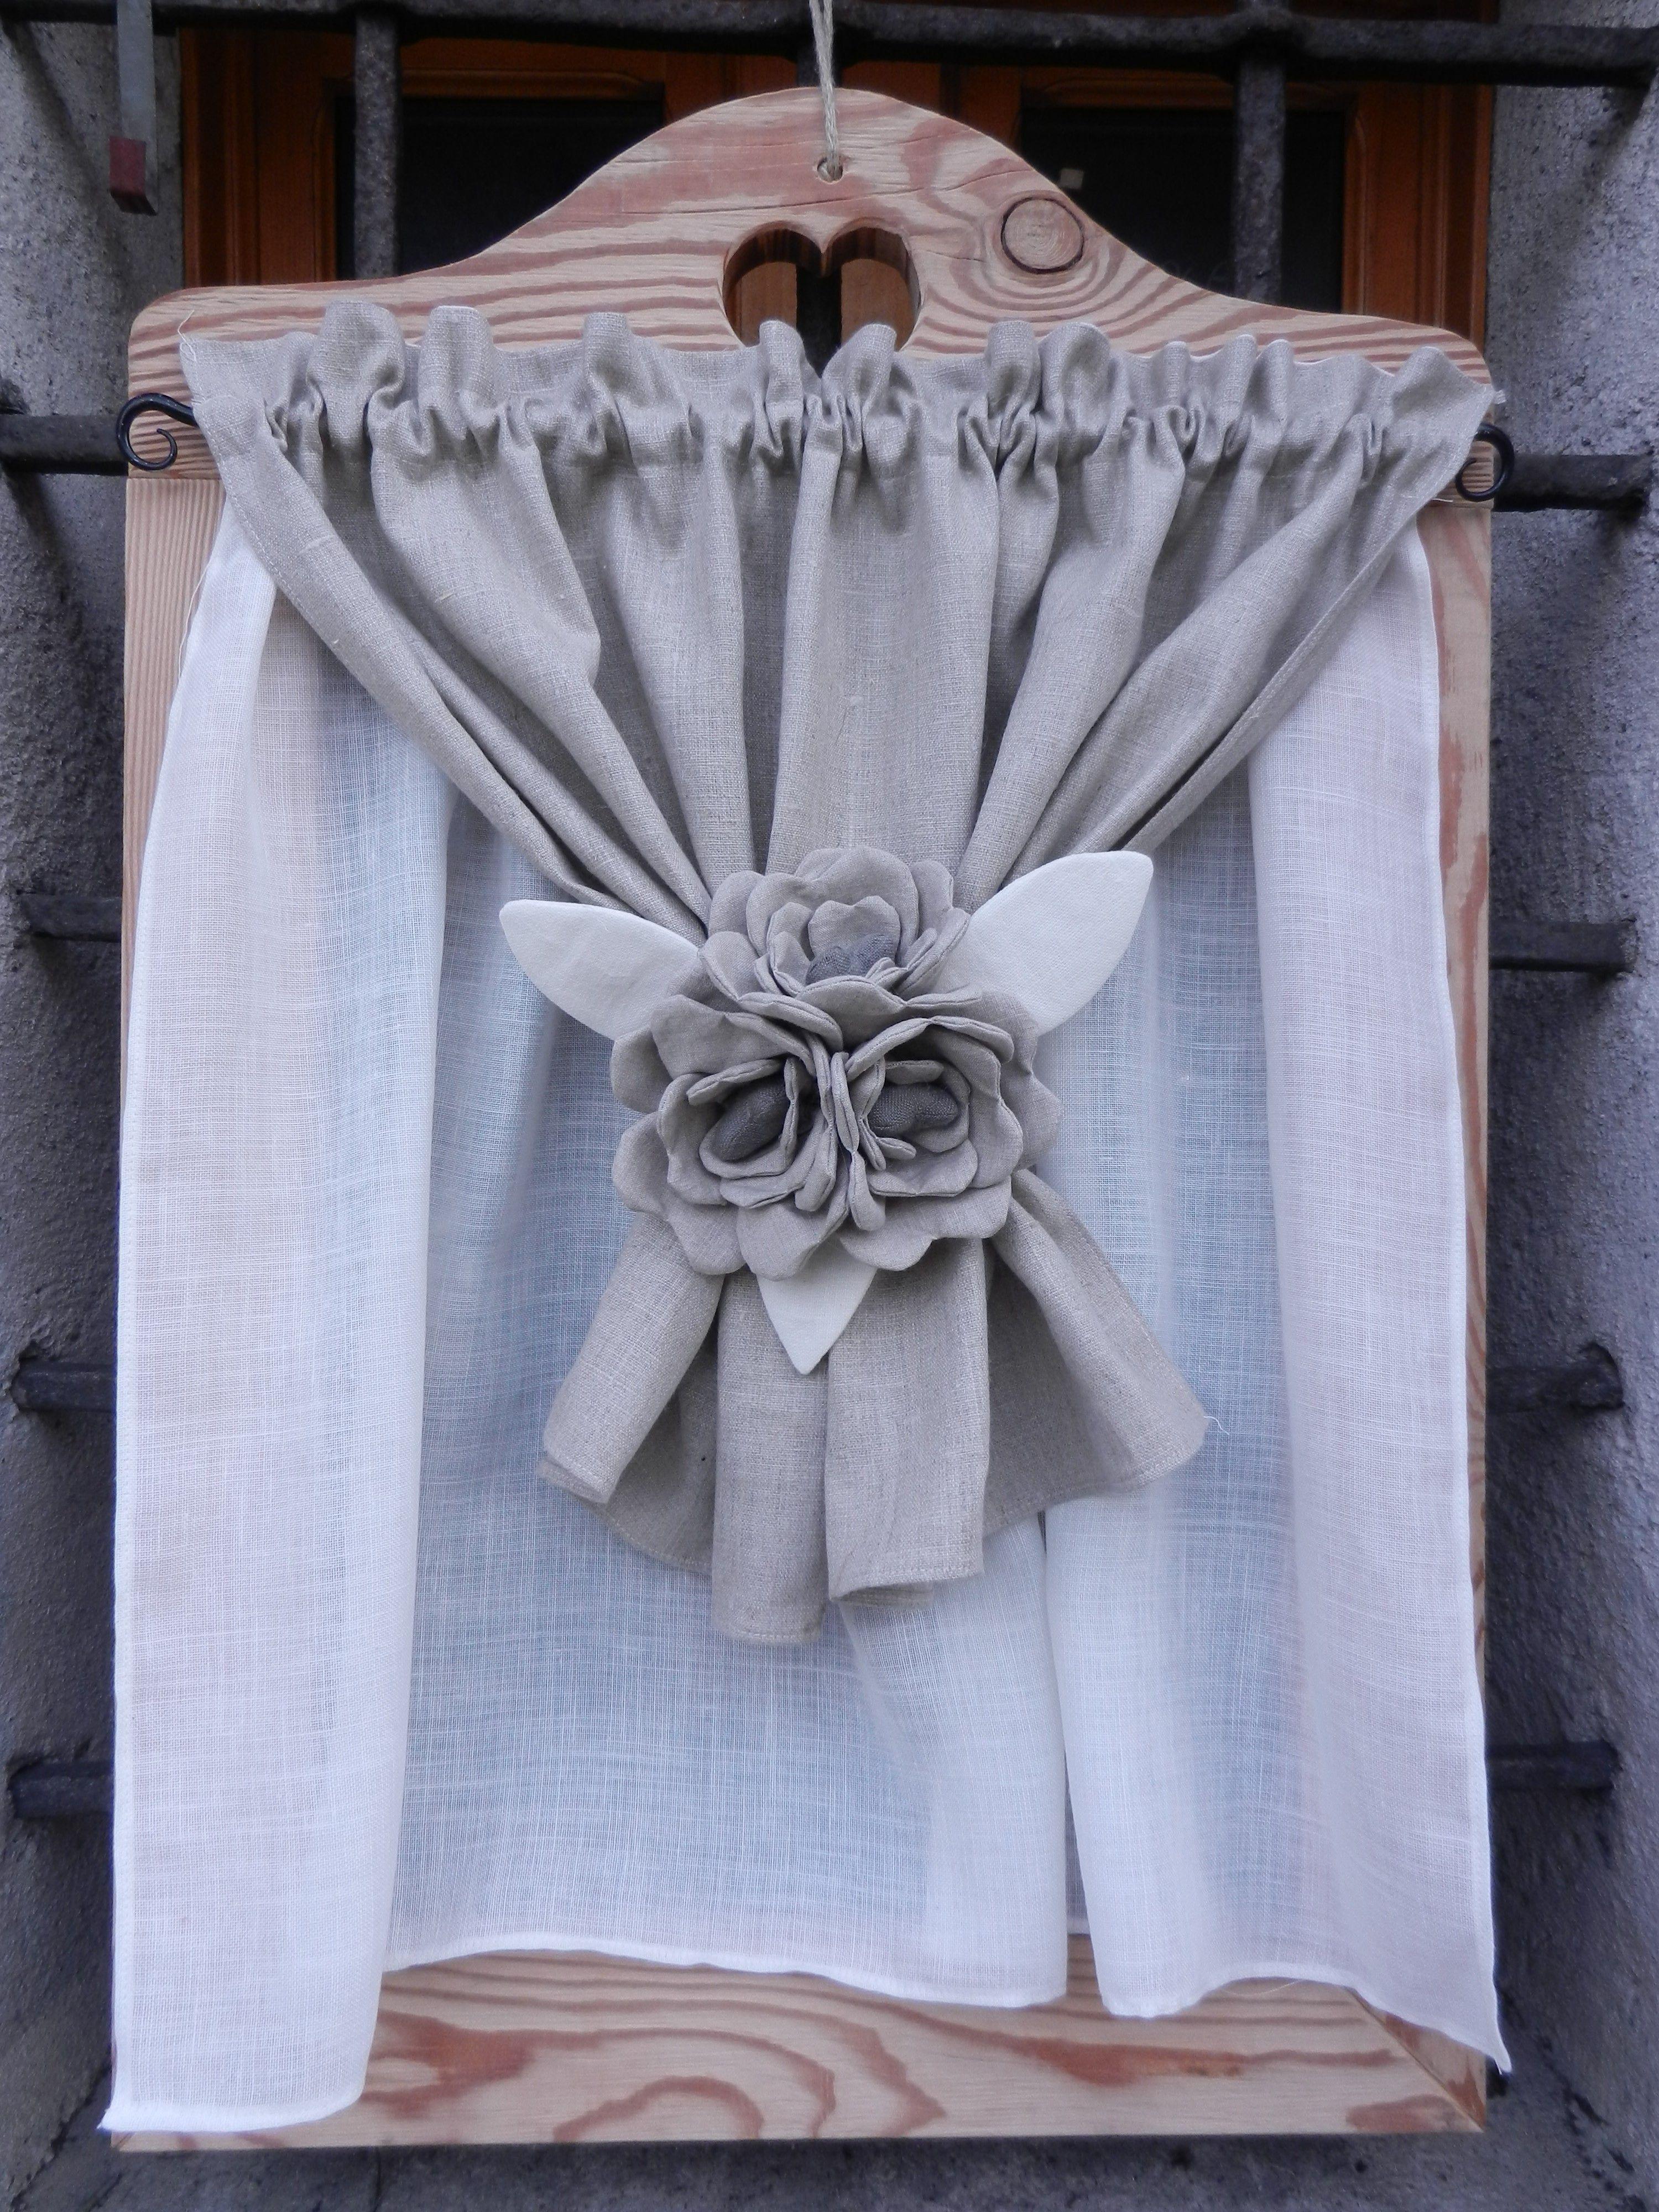 Tendina con gardenie centrali   Window Treatments   Tende ...